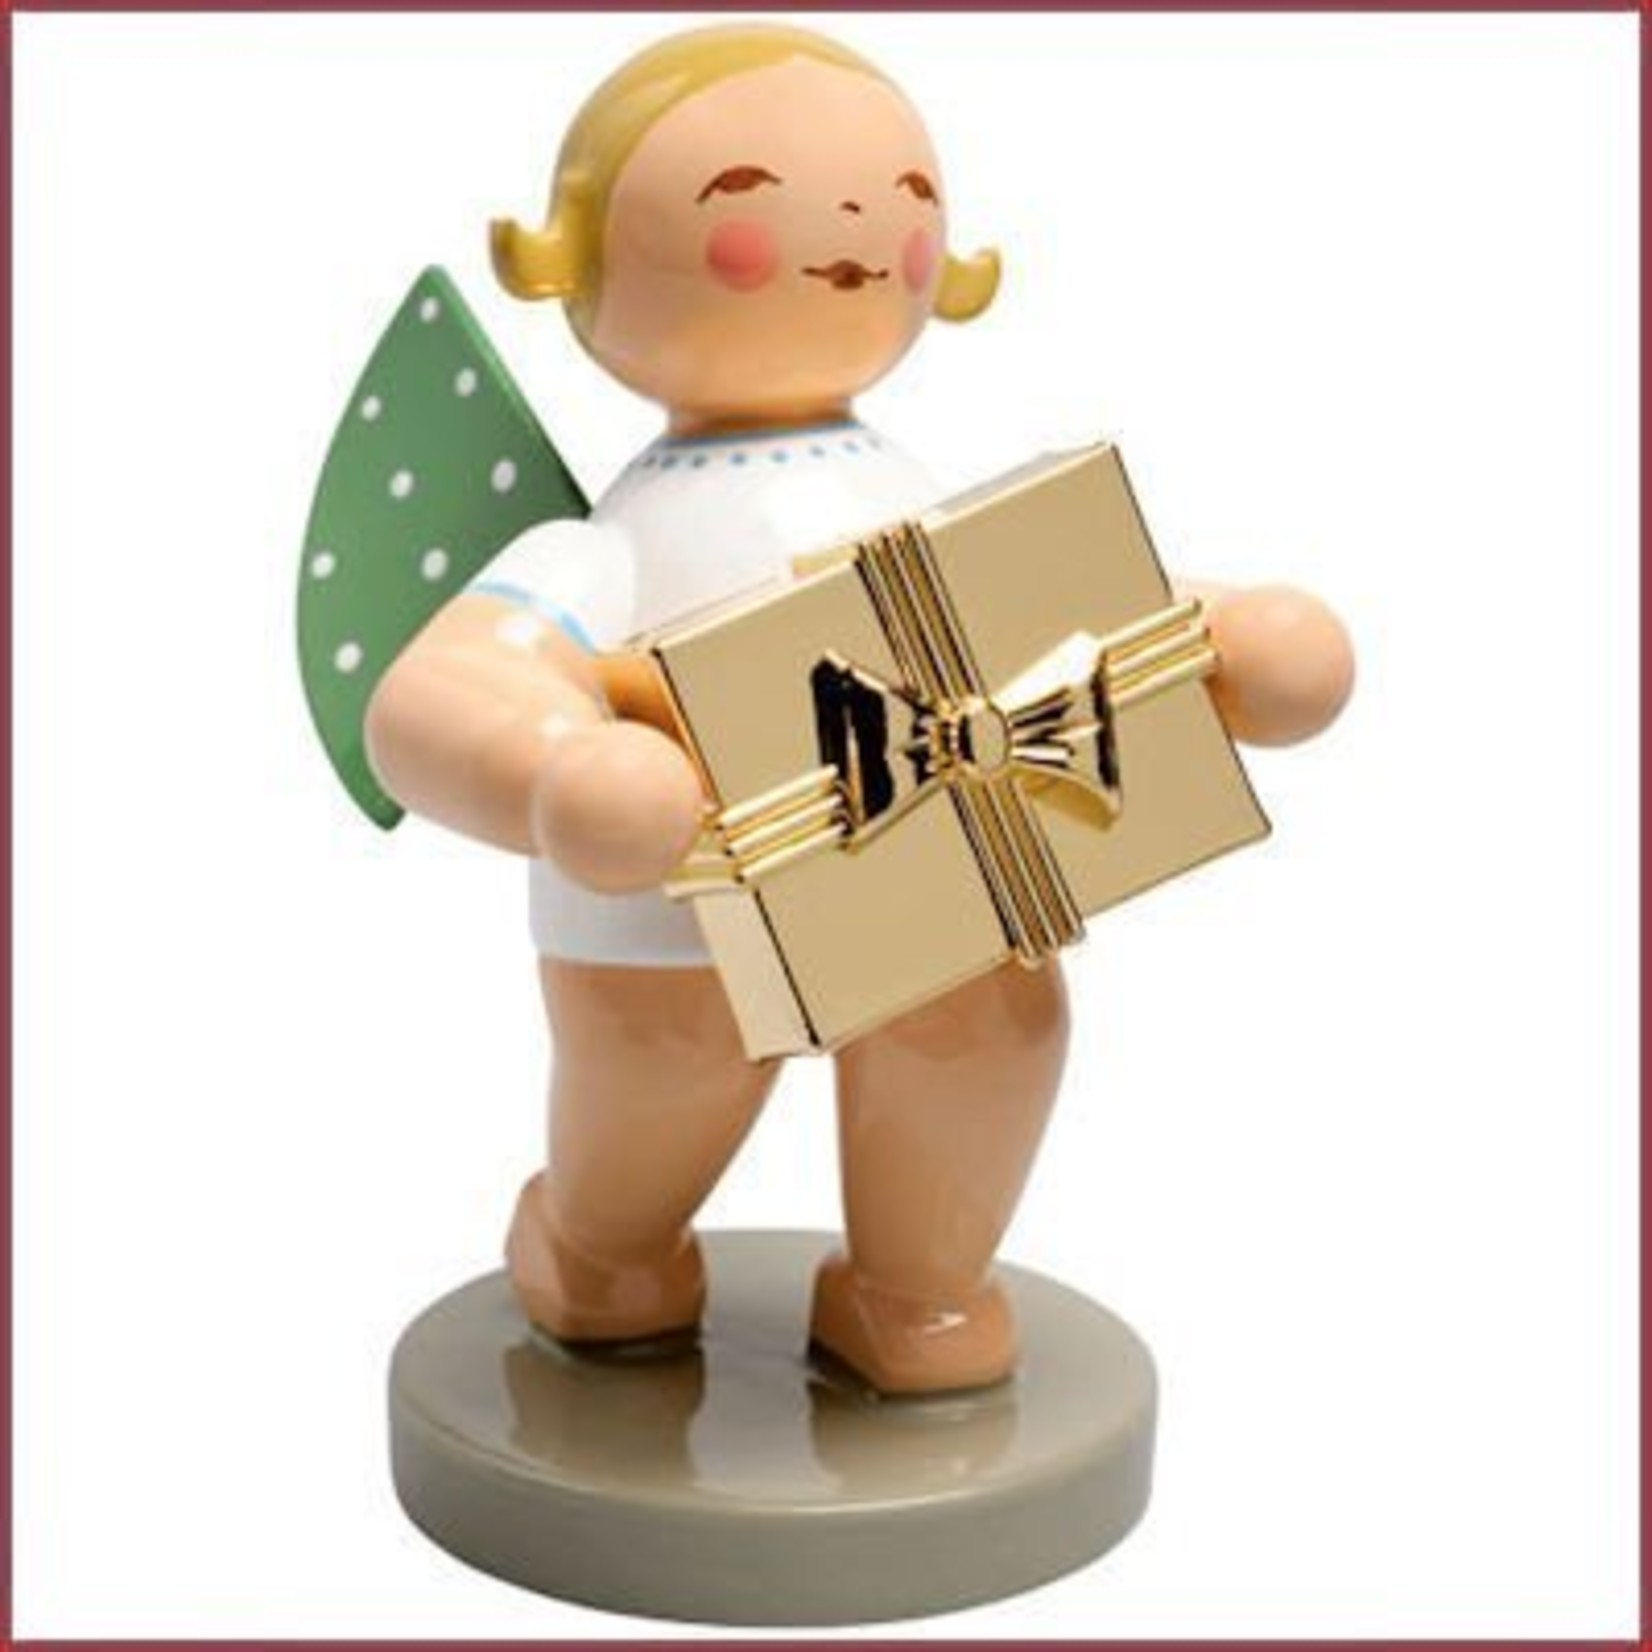 Wendt & Kühn Gold Edition - Grunhainichense Engel met cadeau